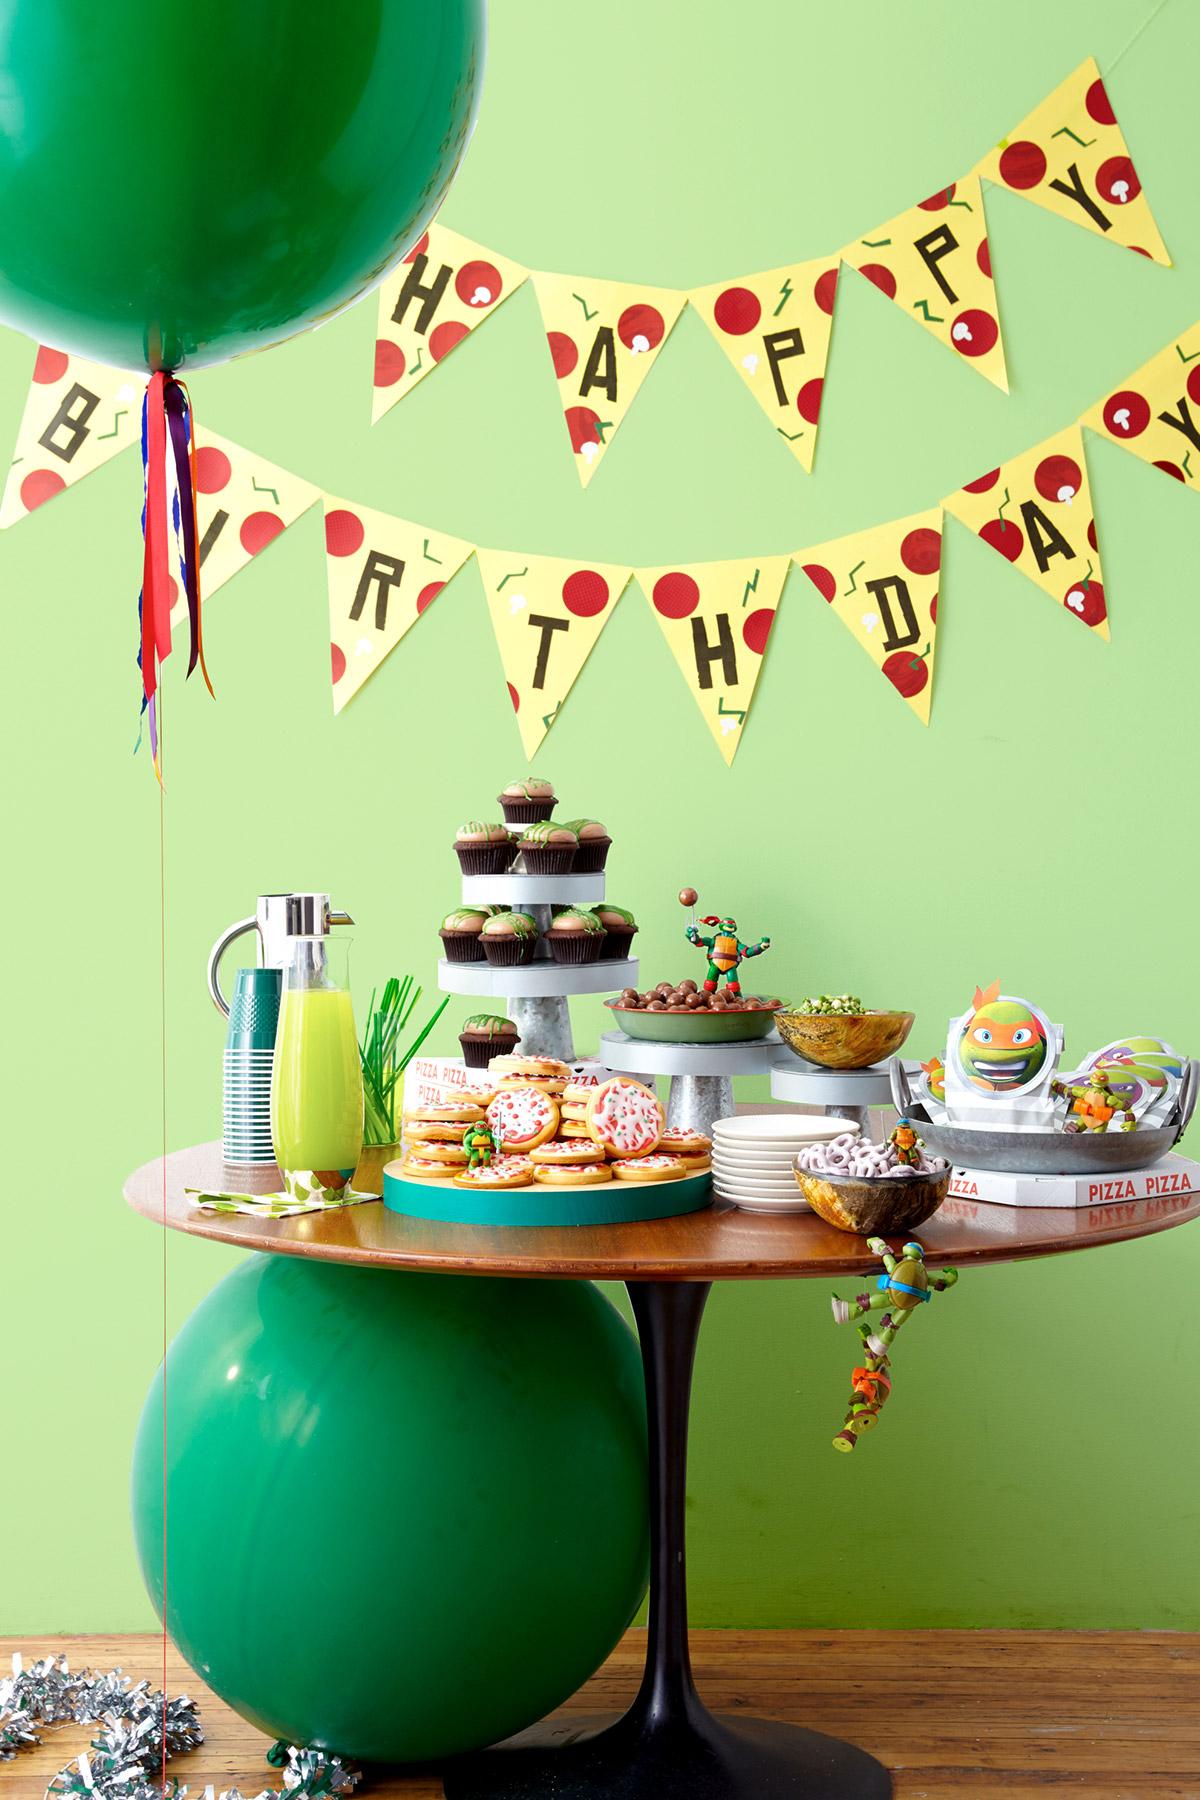 Throw A Ninja Turtles Birthday Party! | Nickelodeon Parents - Free Printable Ninja Turtle Birthday Banner